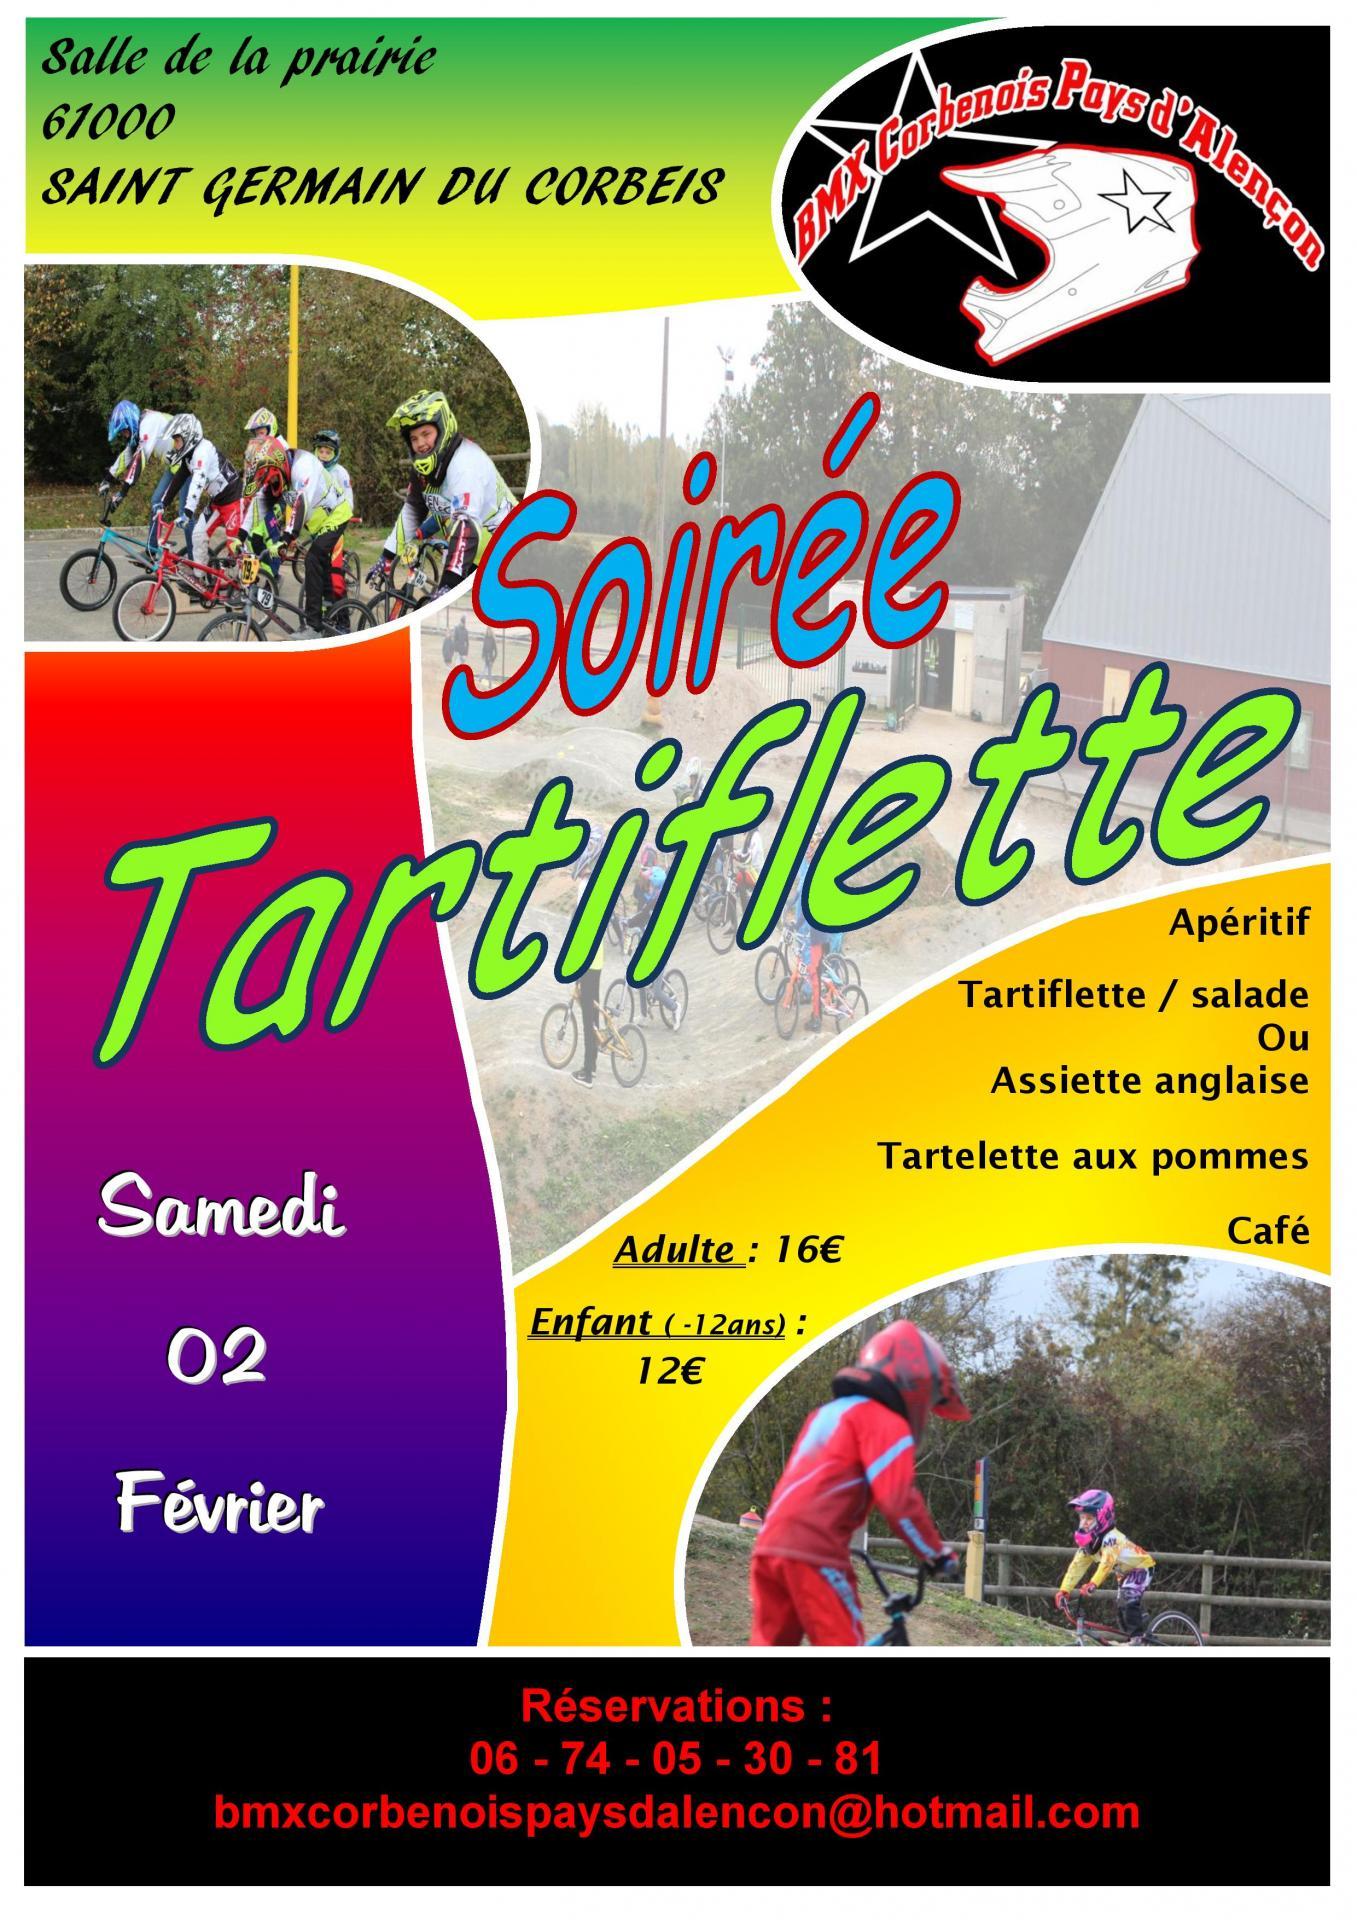 Soiree 0202